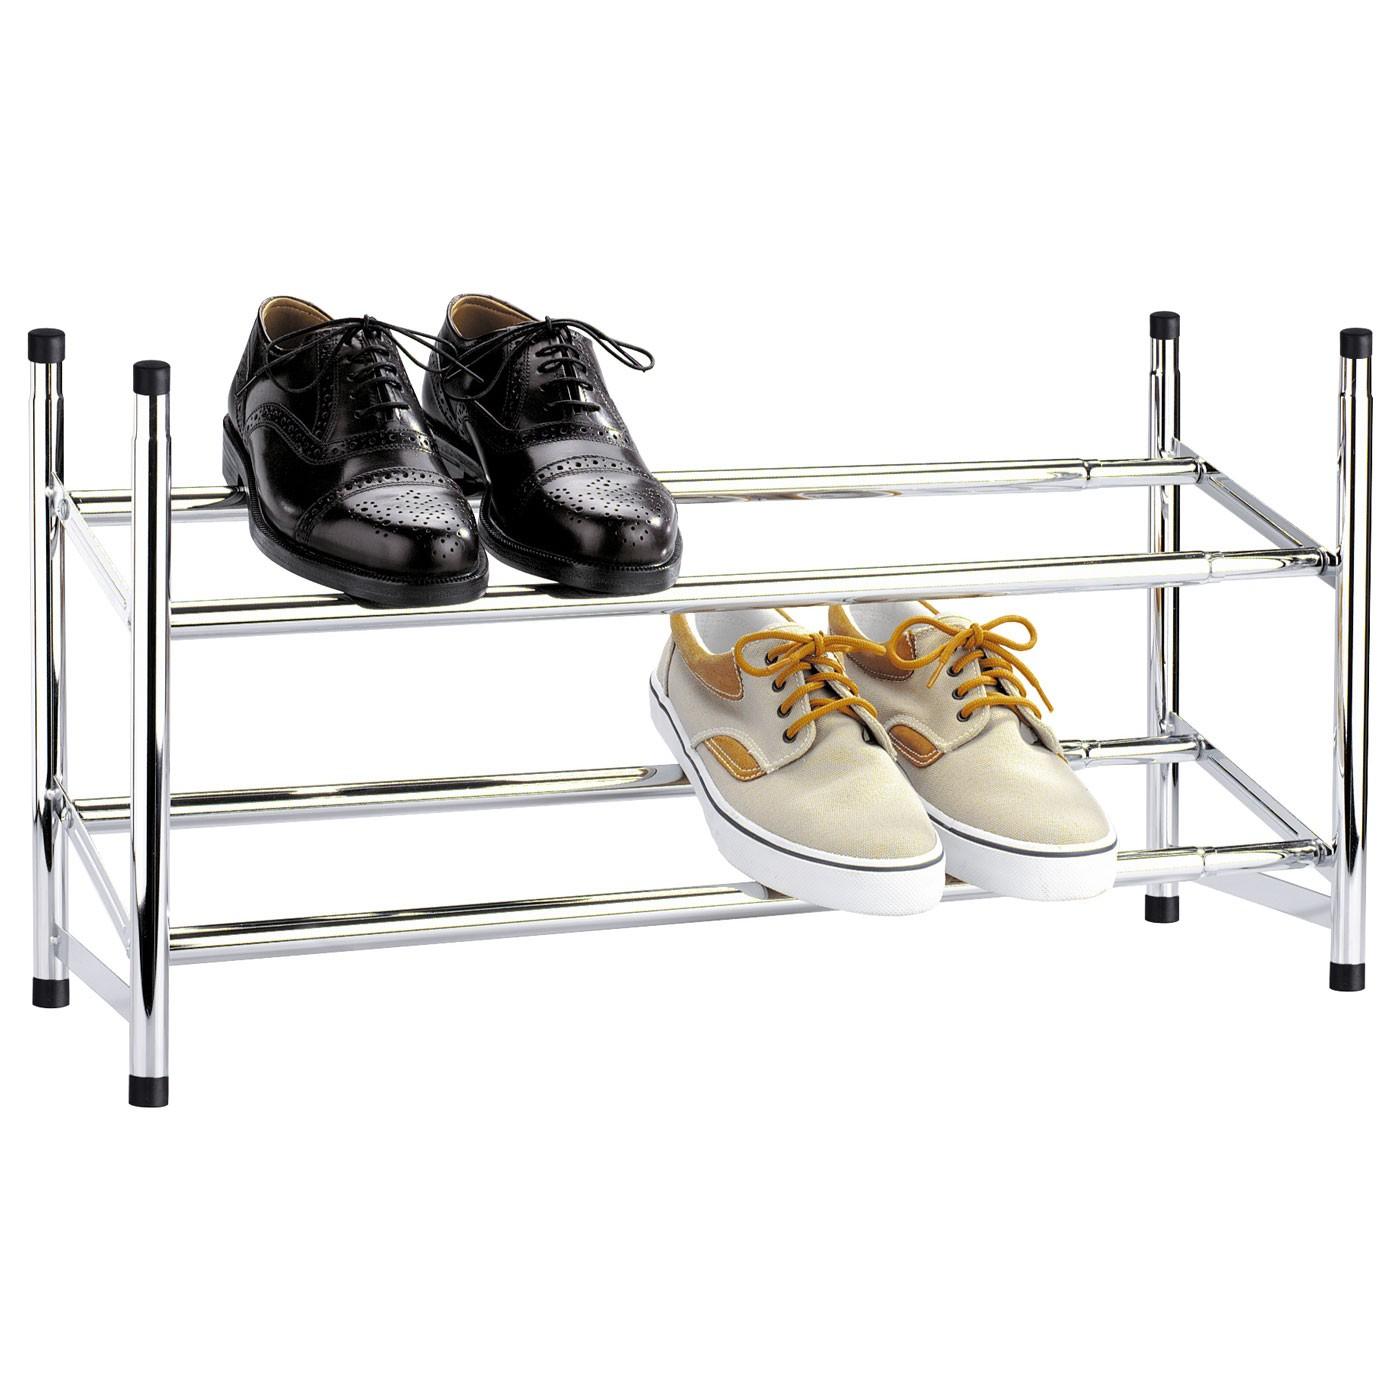 Schuhregal ausziehbar - Porte chaussures coulissant ...